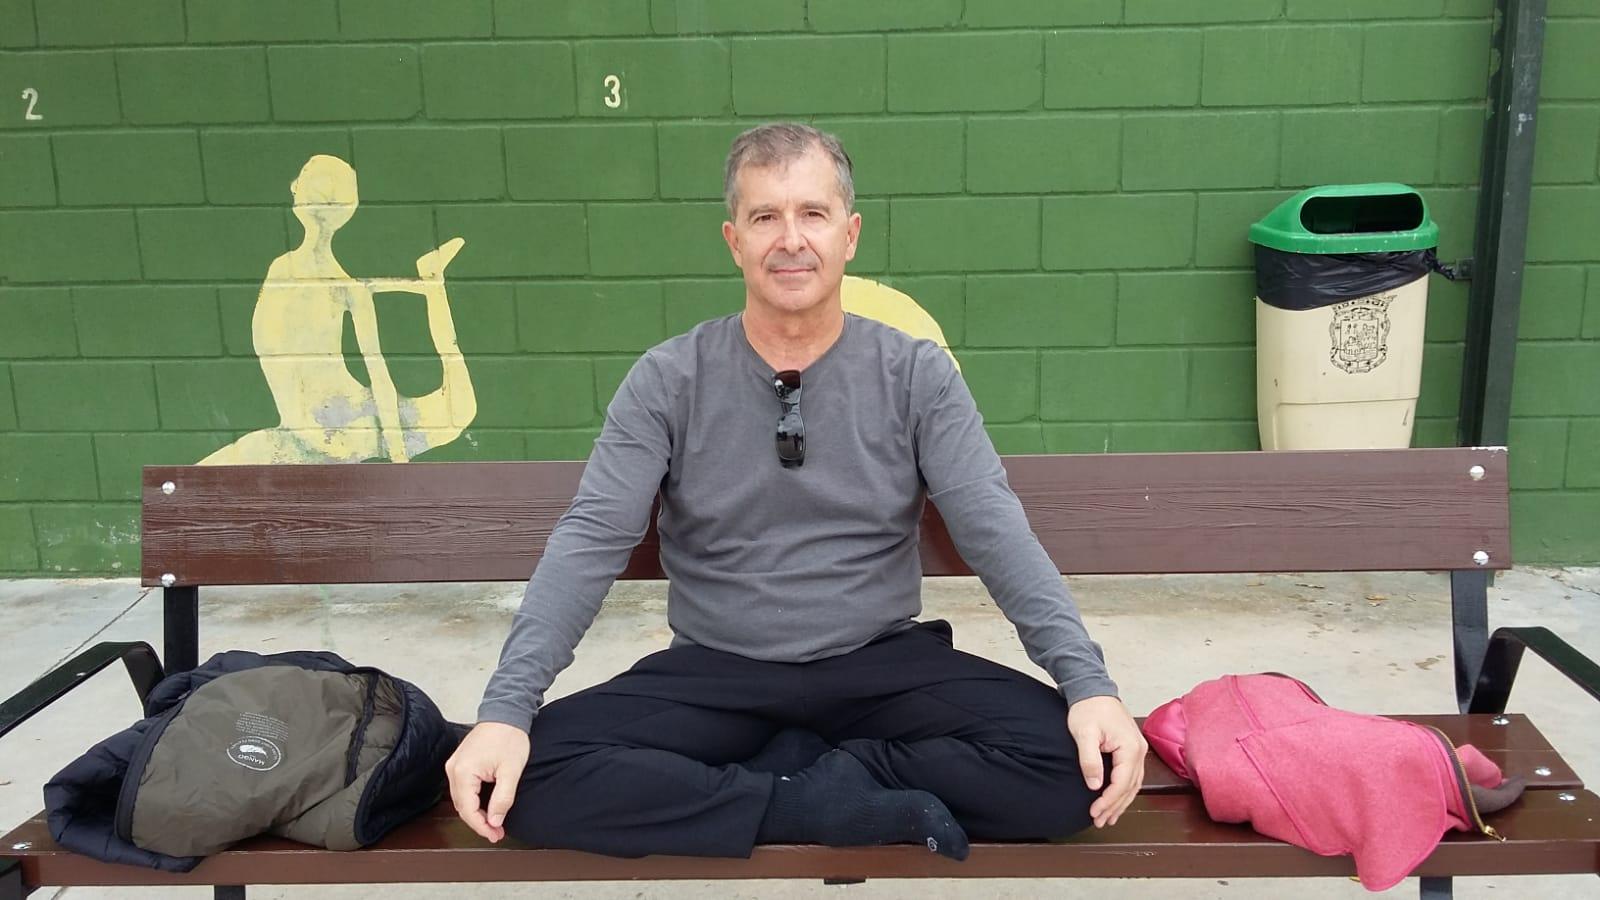 Jose-Manuel-yoga-1